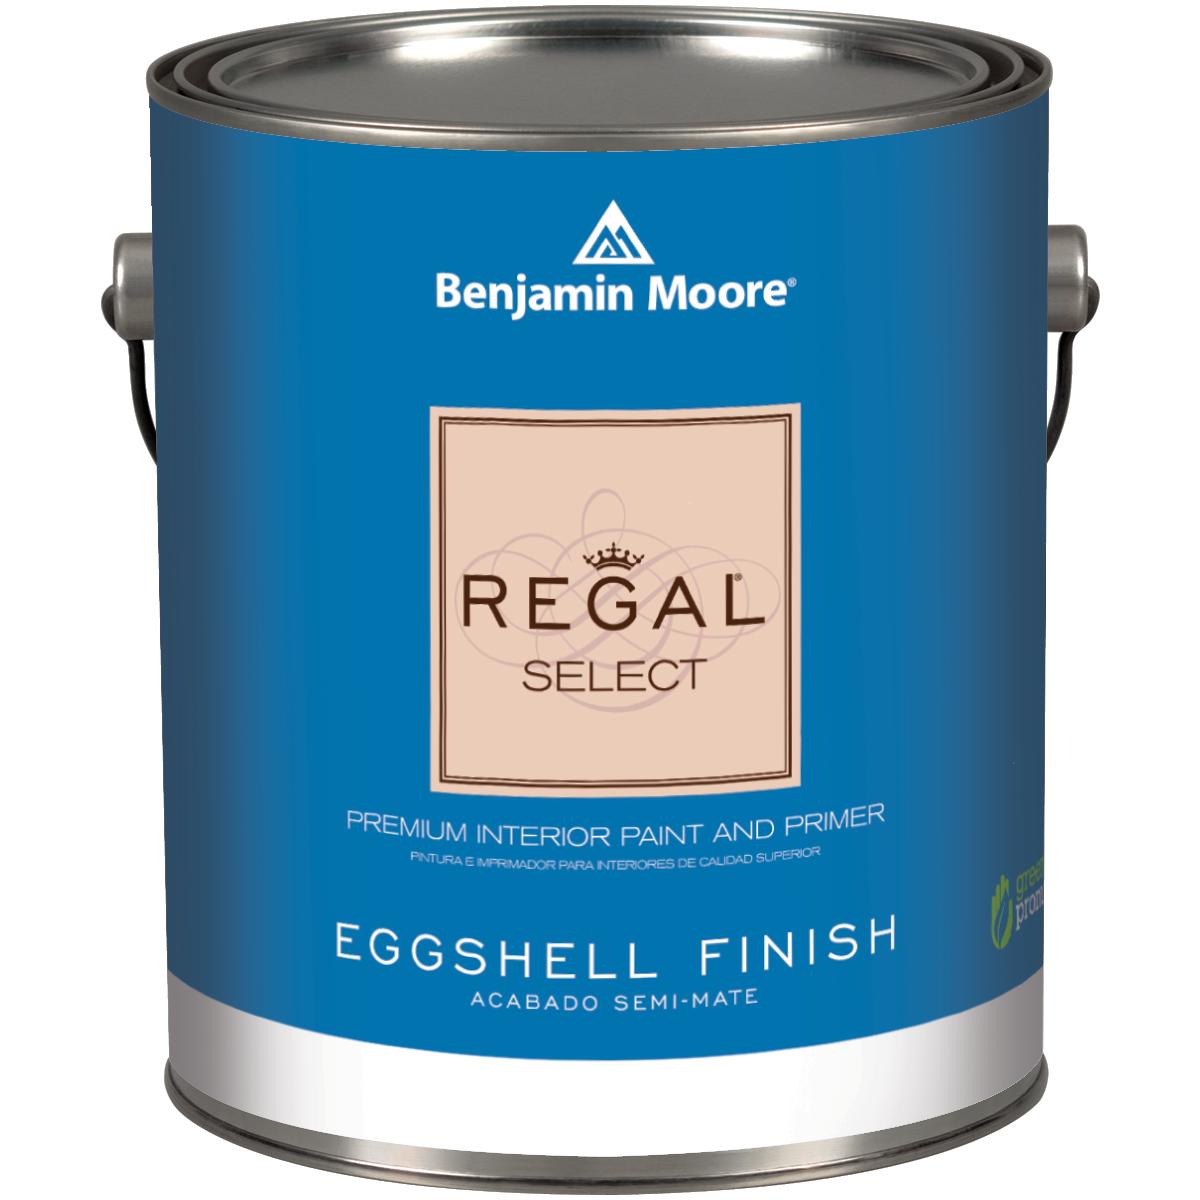 Regal select waterborne interior paint leslie street - Eggshell paint in bathroom ...